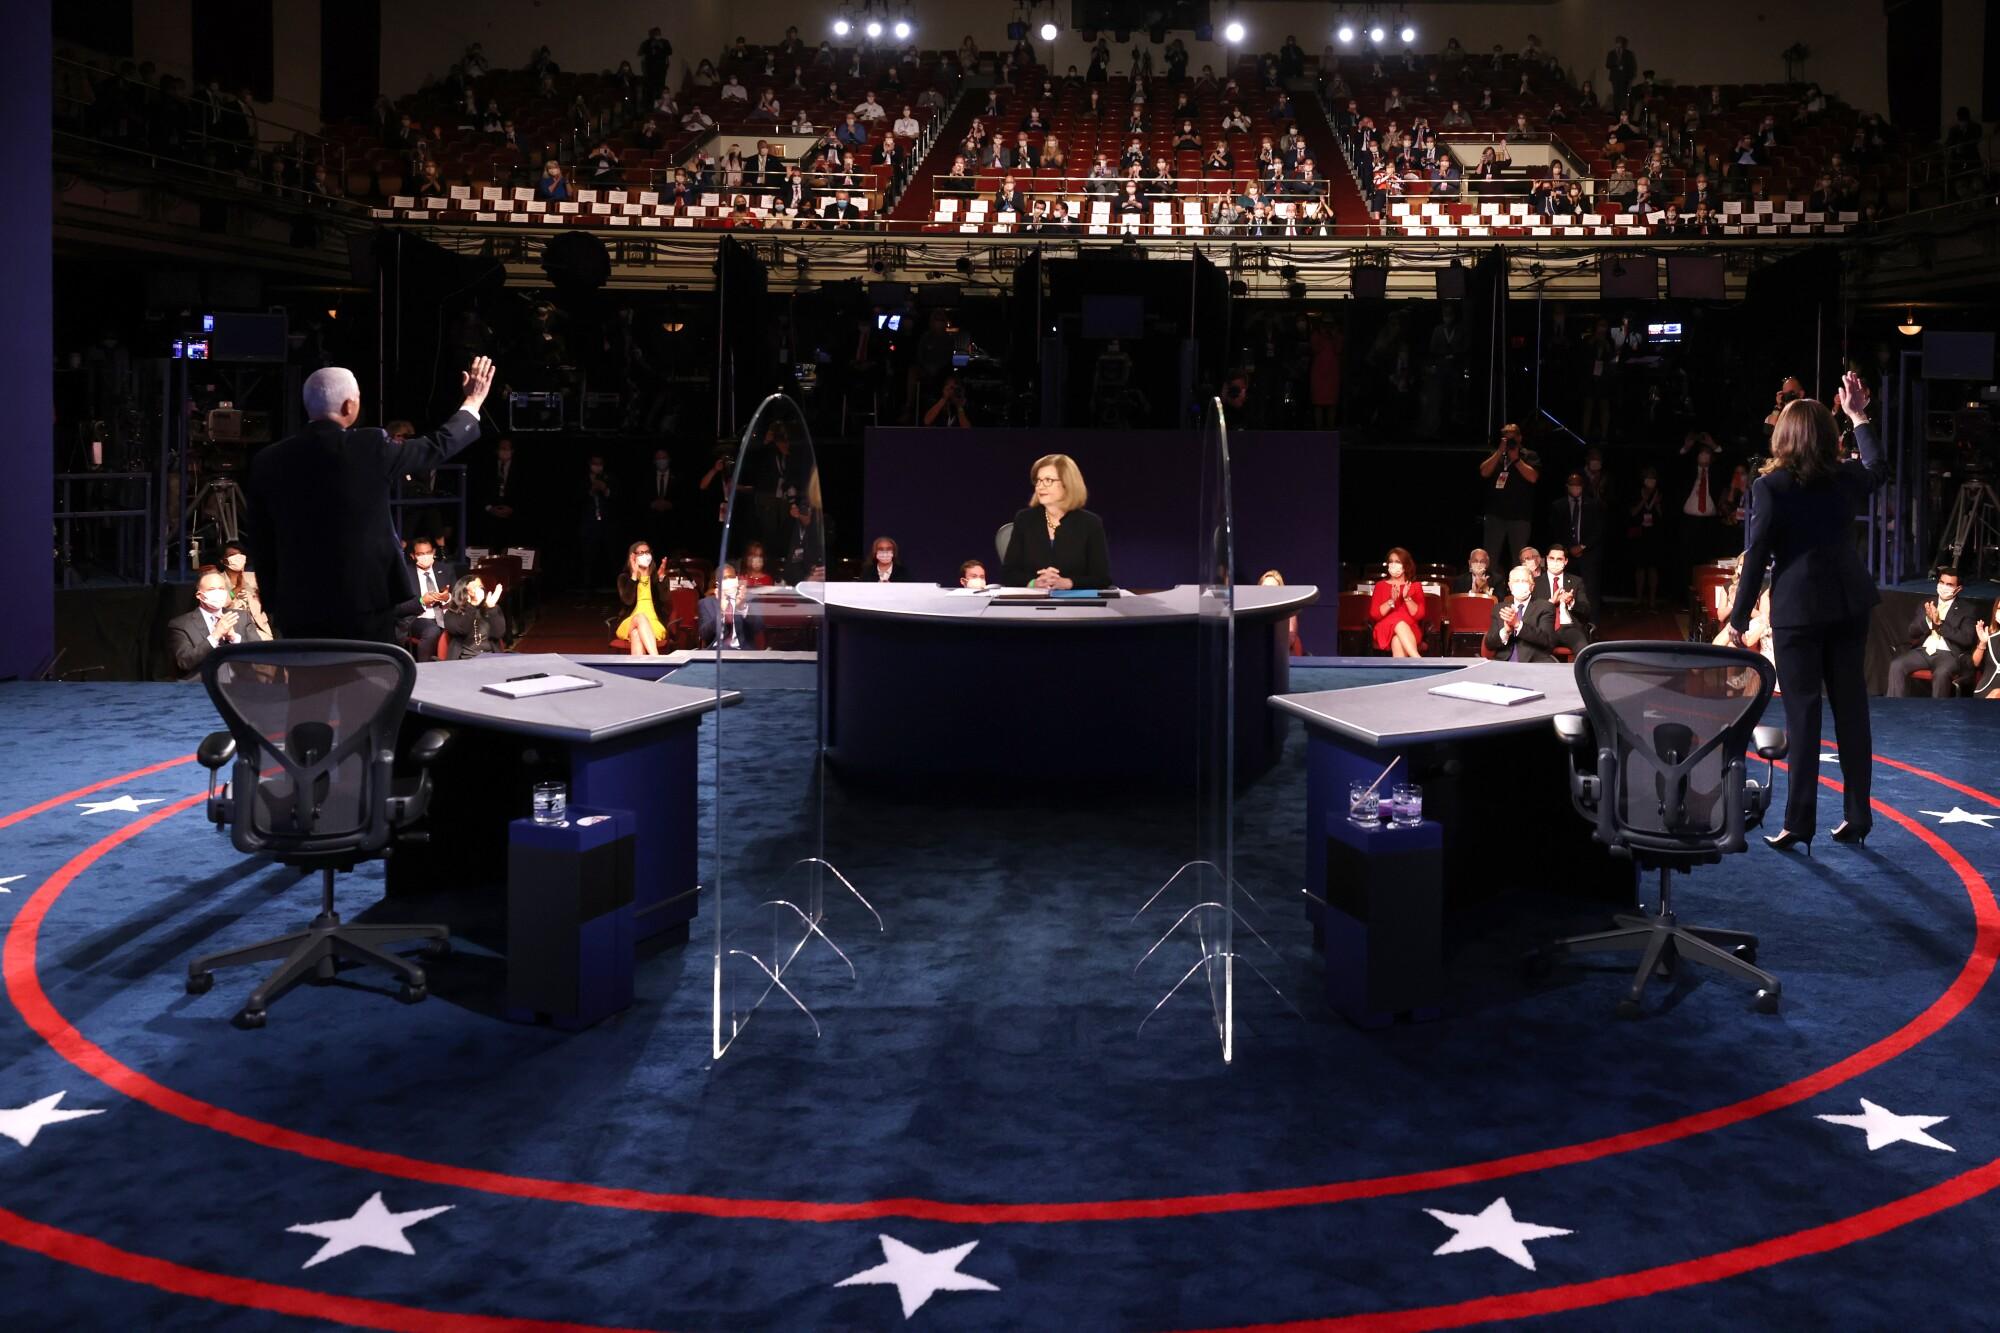 Mike Pence, Kamala Harris and Susan Page at the vice presidential debate in Salt Lake City.